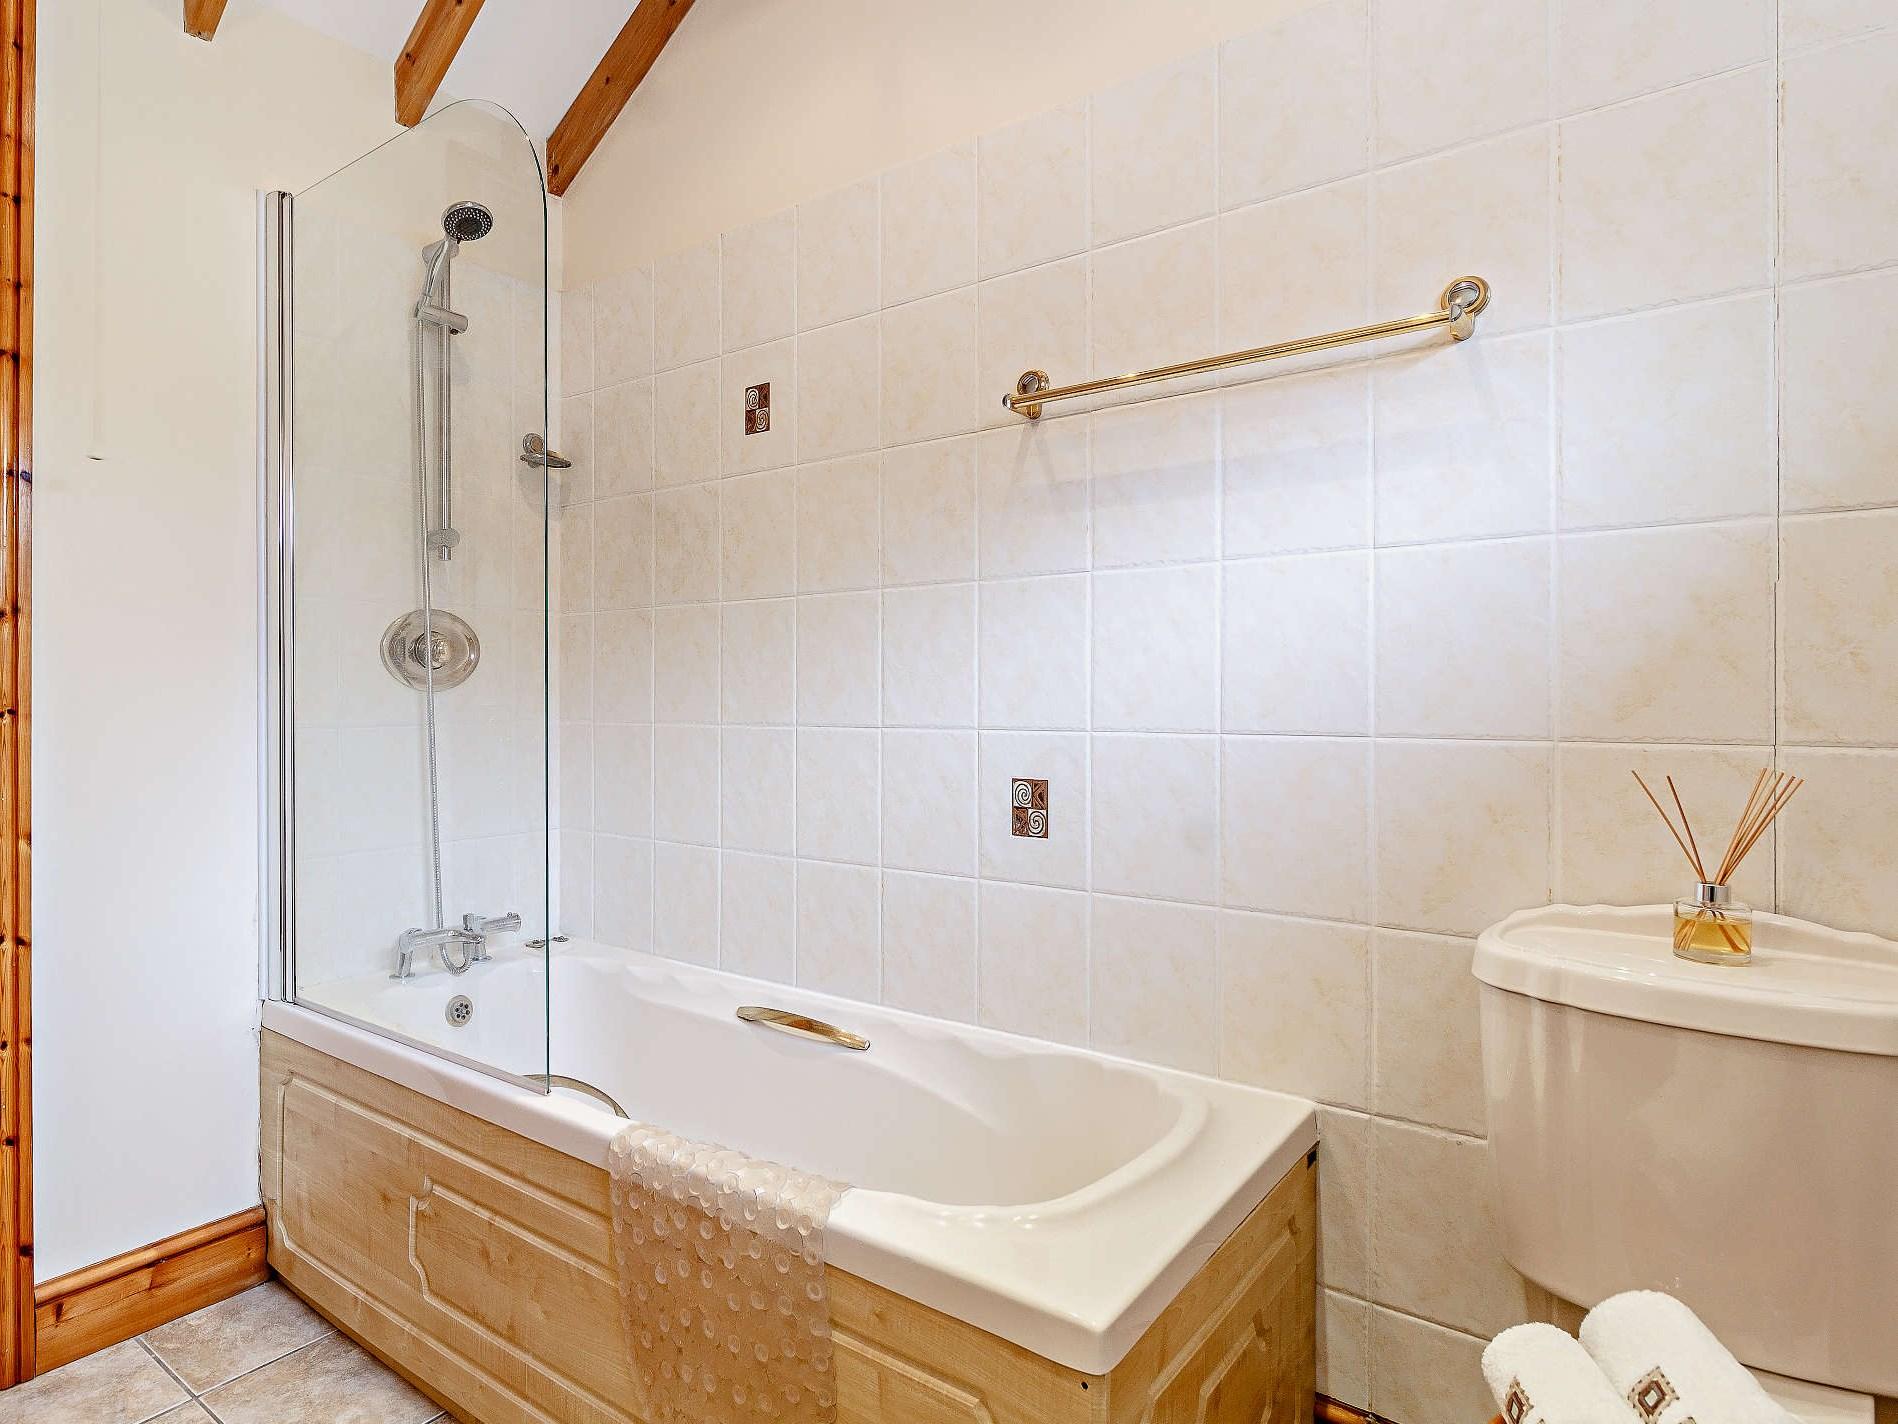 2 Bedroom Bungalow in Norfolk, East Anglia